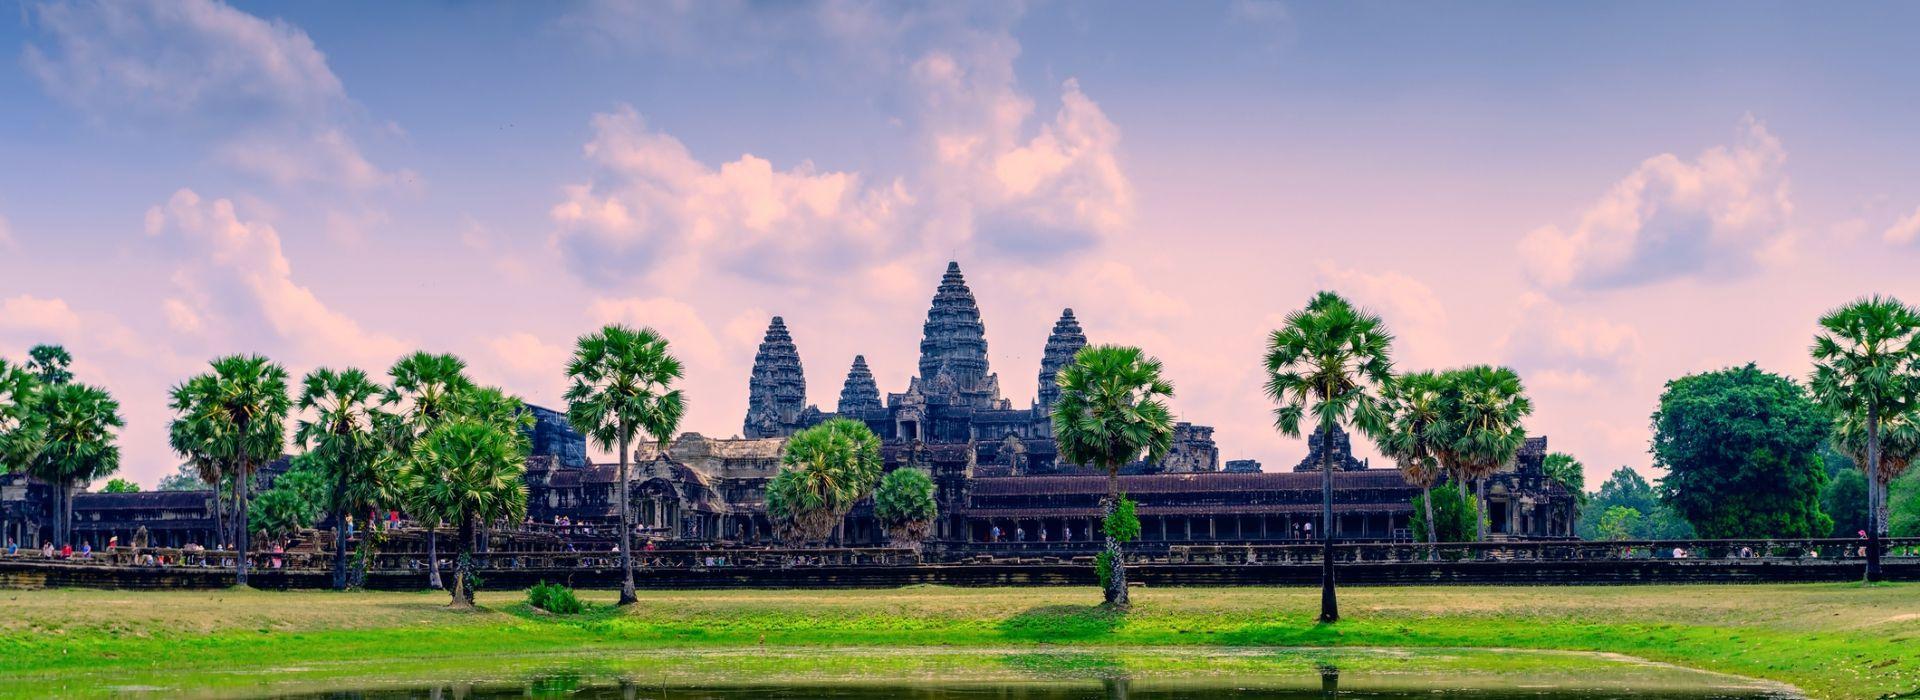 Cruise Tours in Siem Reap